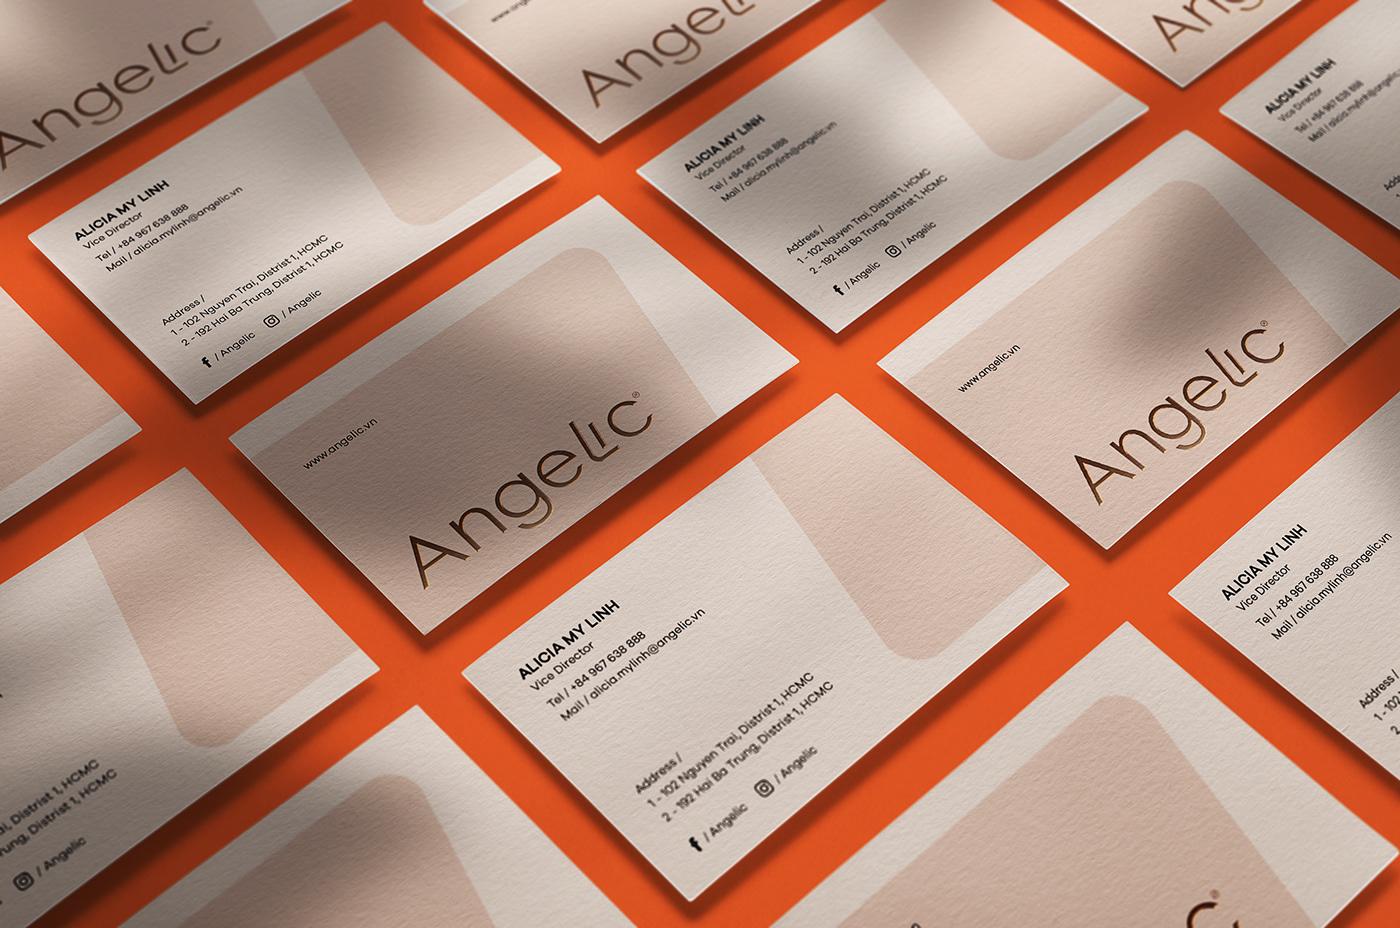 Image may contain: screenshot, orange and book